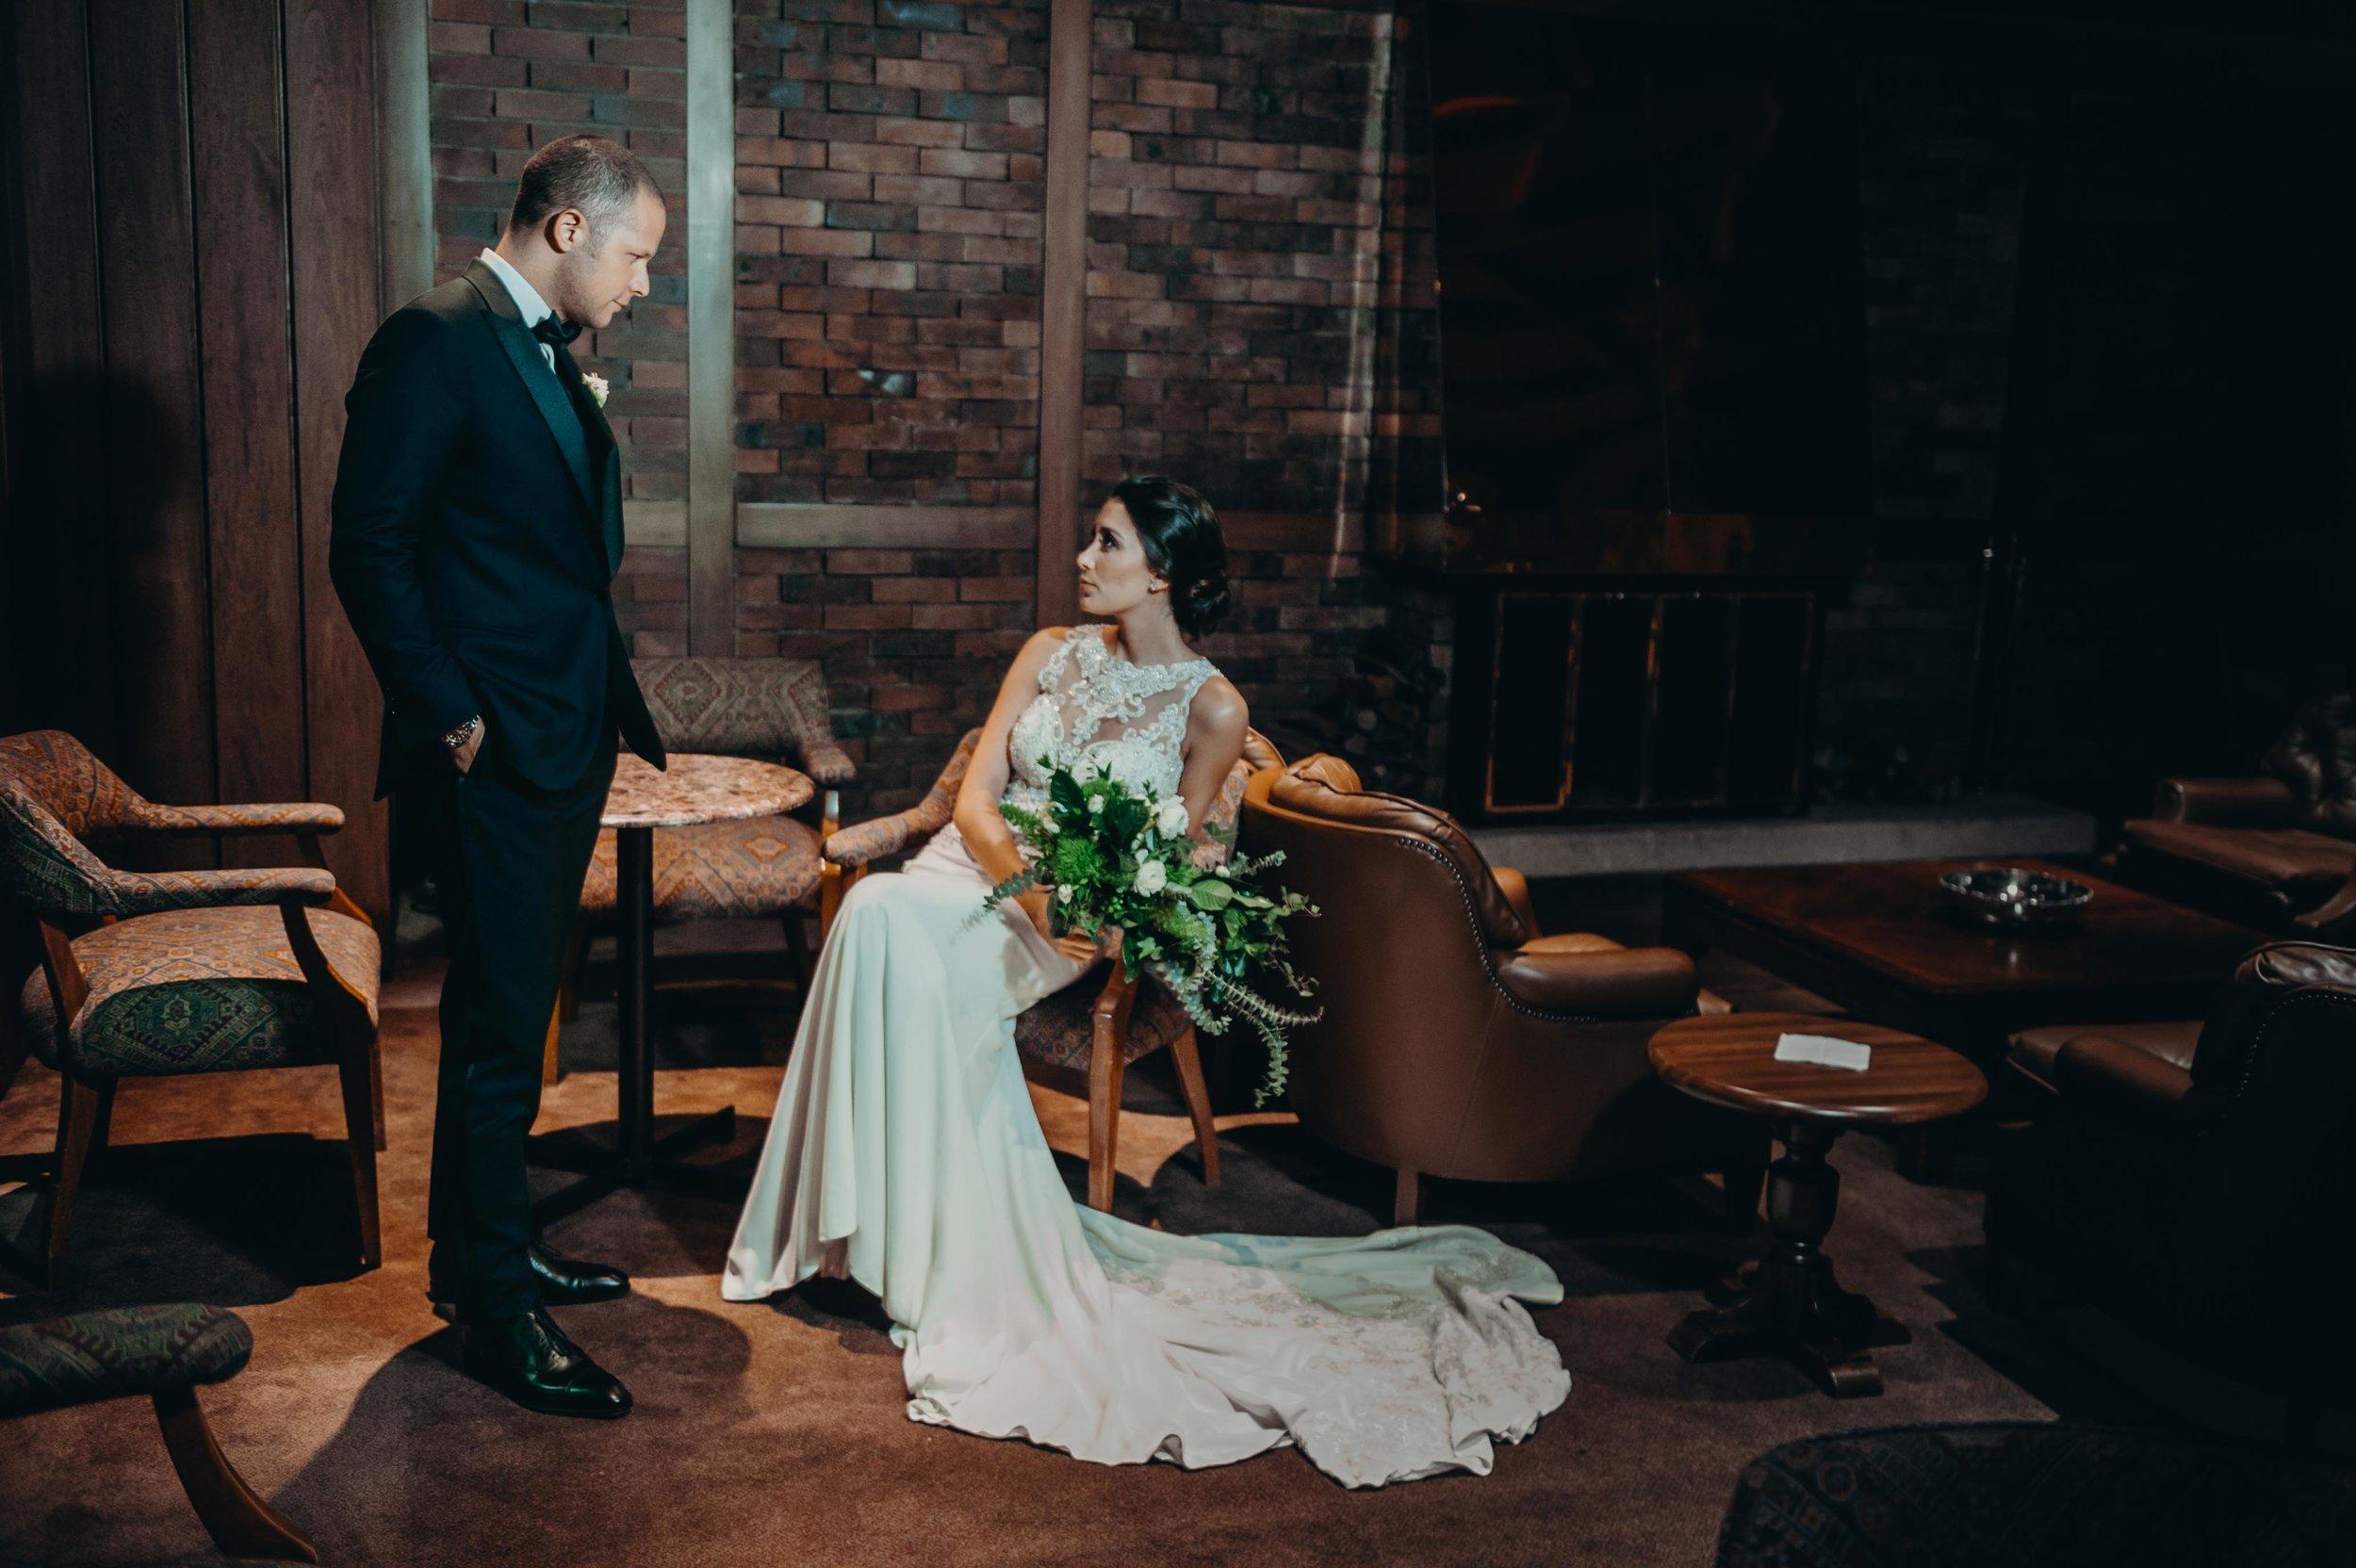 fotografia matrimonio  bogota19.jpg